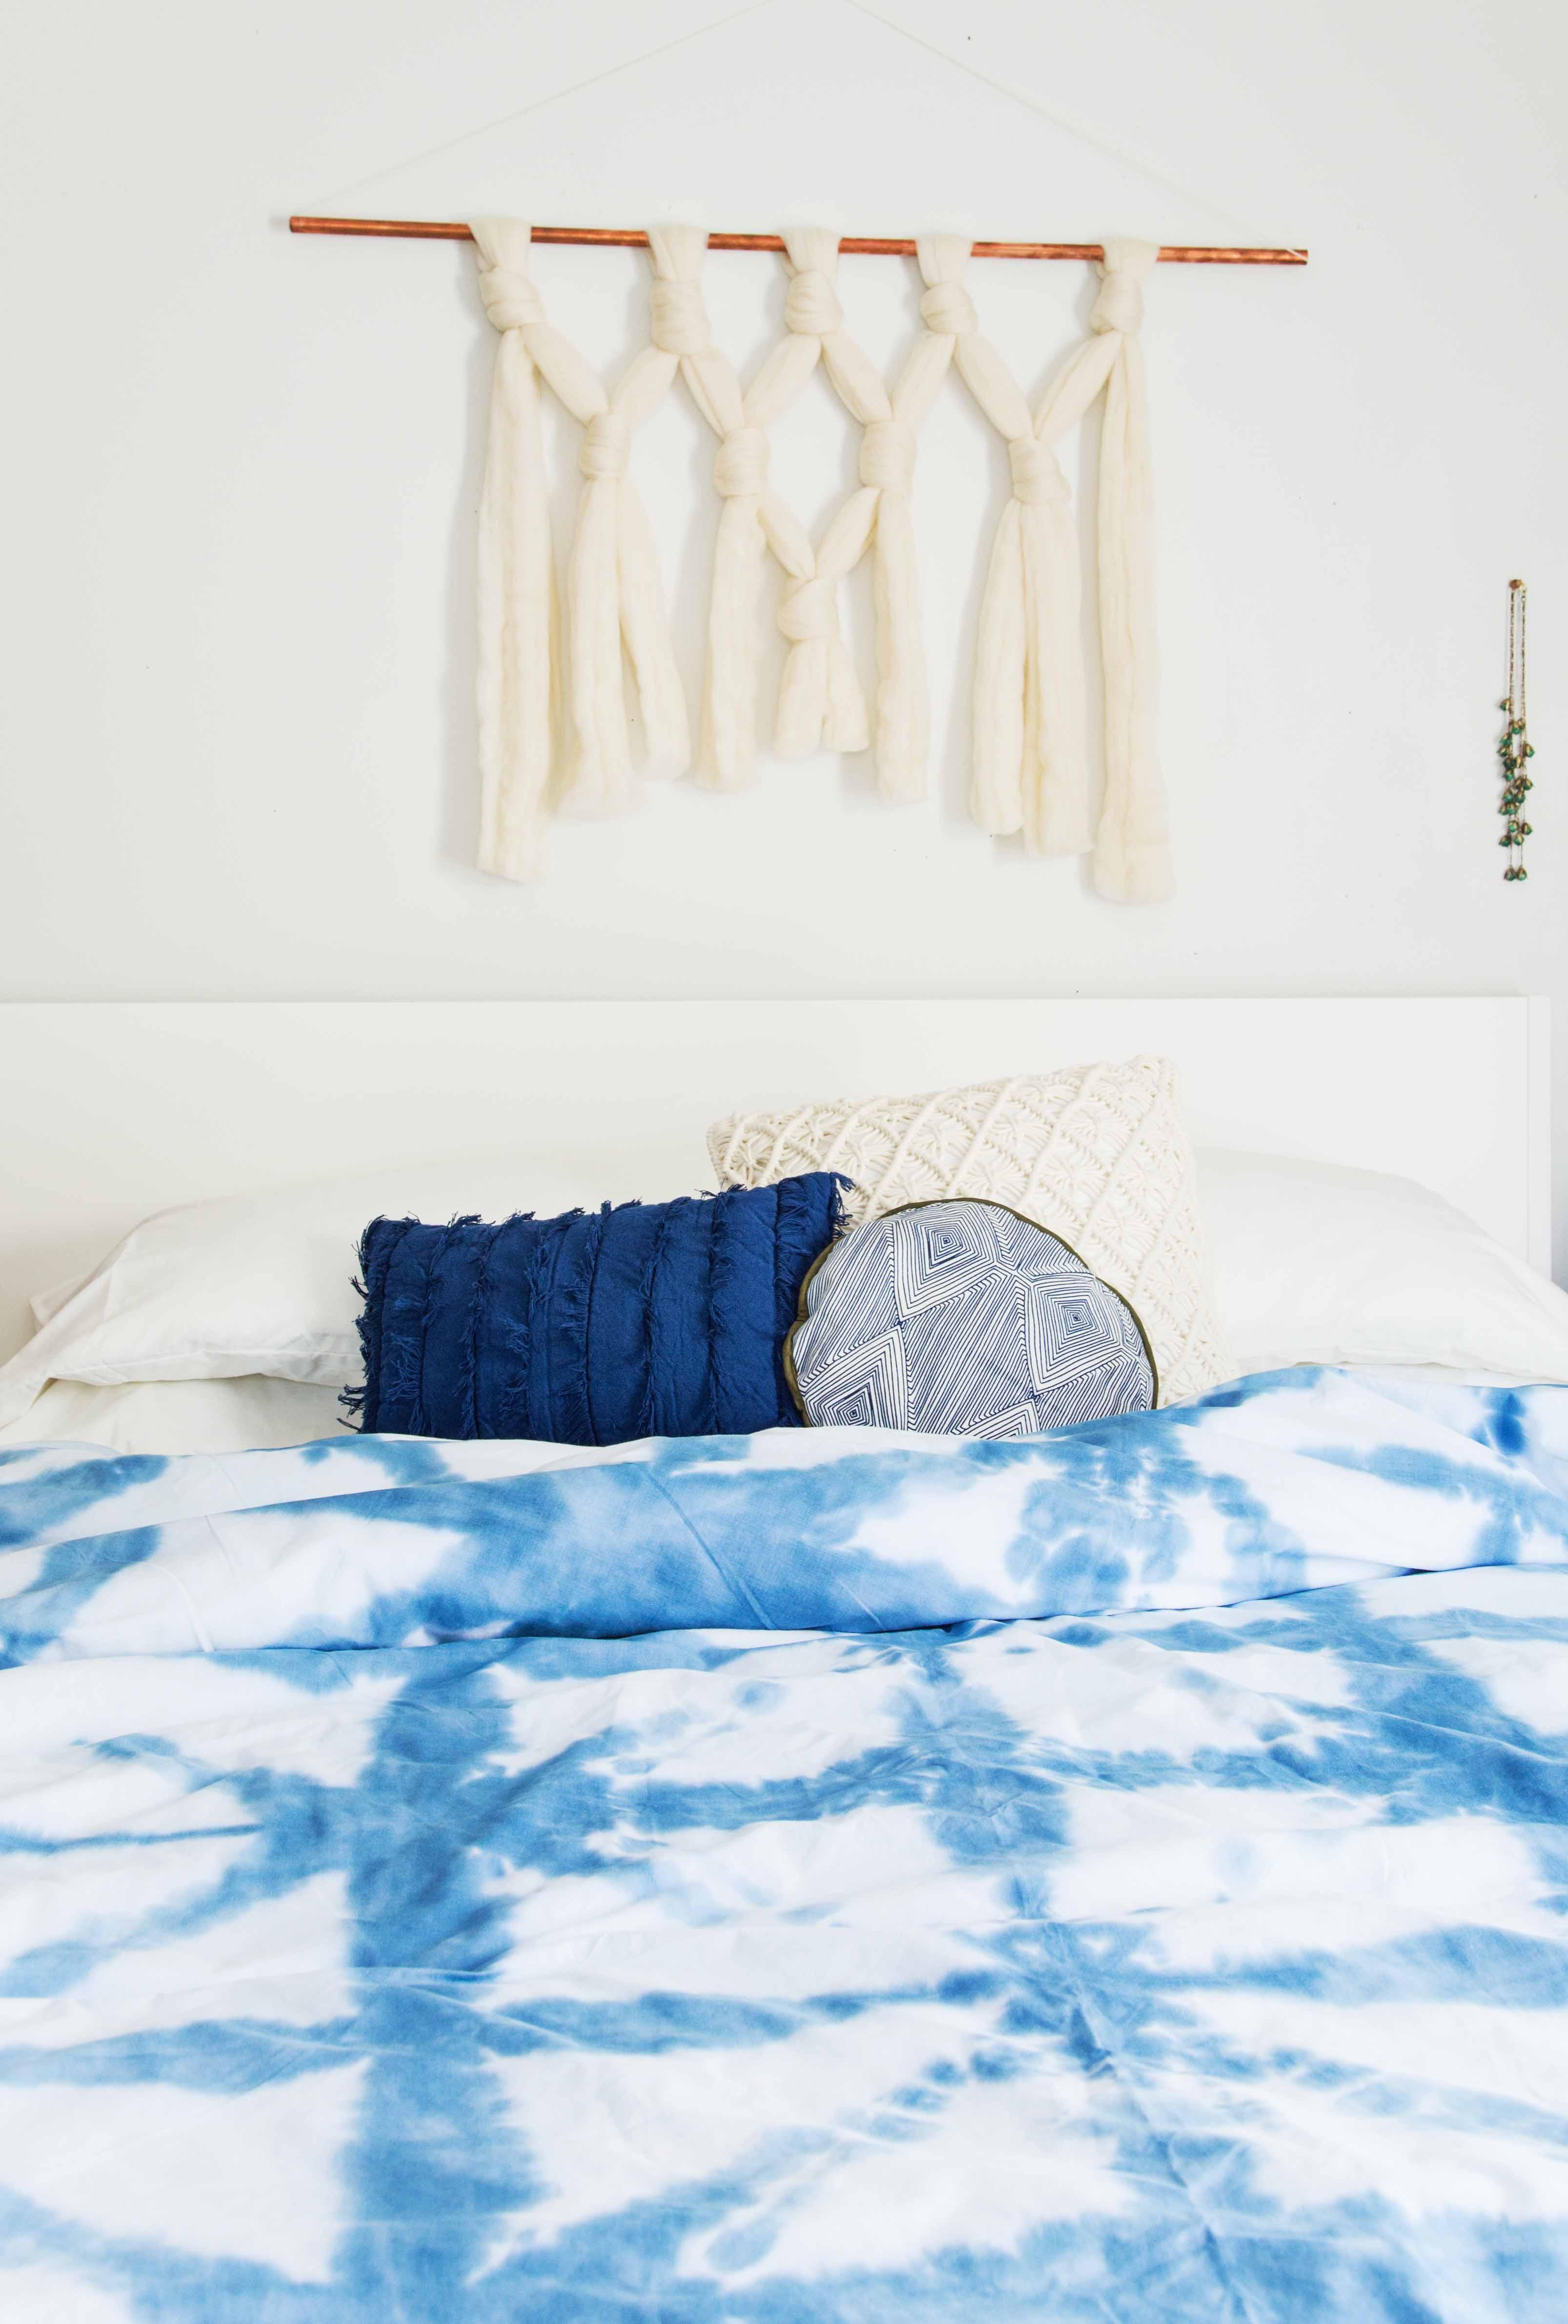 Perfect  uIKEA DVALA duvet cover yards of rope or twine packets of Tulip fabric dye in denim blue cup table salt Saran wrap u x u x u balsa wood